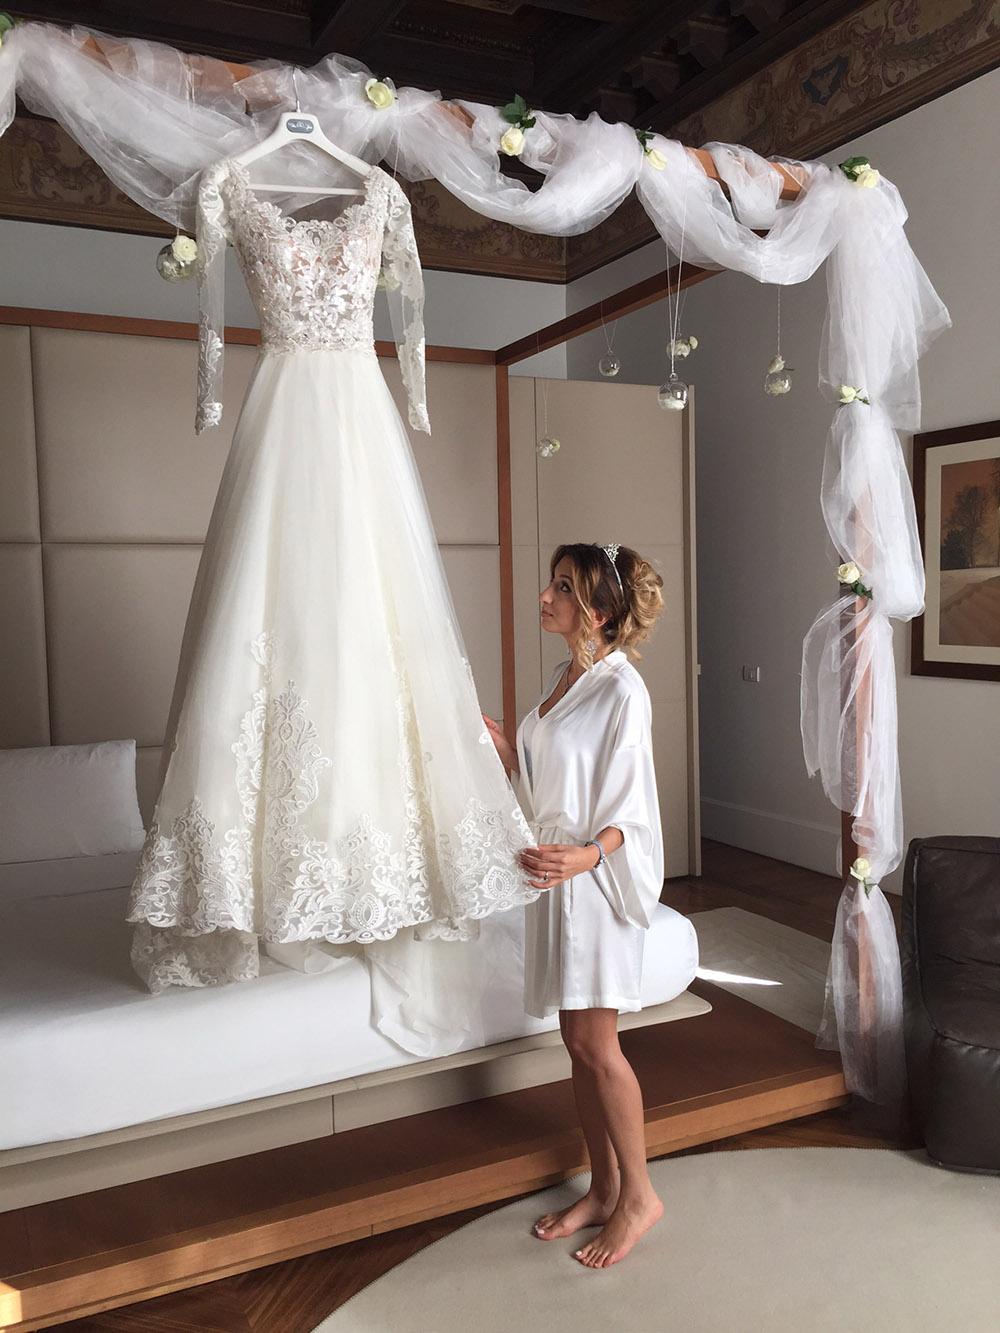 4-armenian-italian-wedding-in-rome-annartstyle-news.JPG